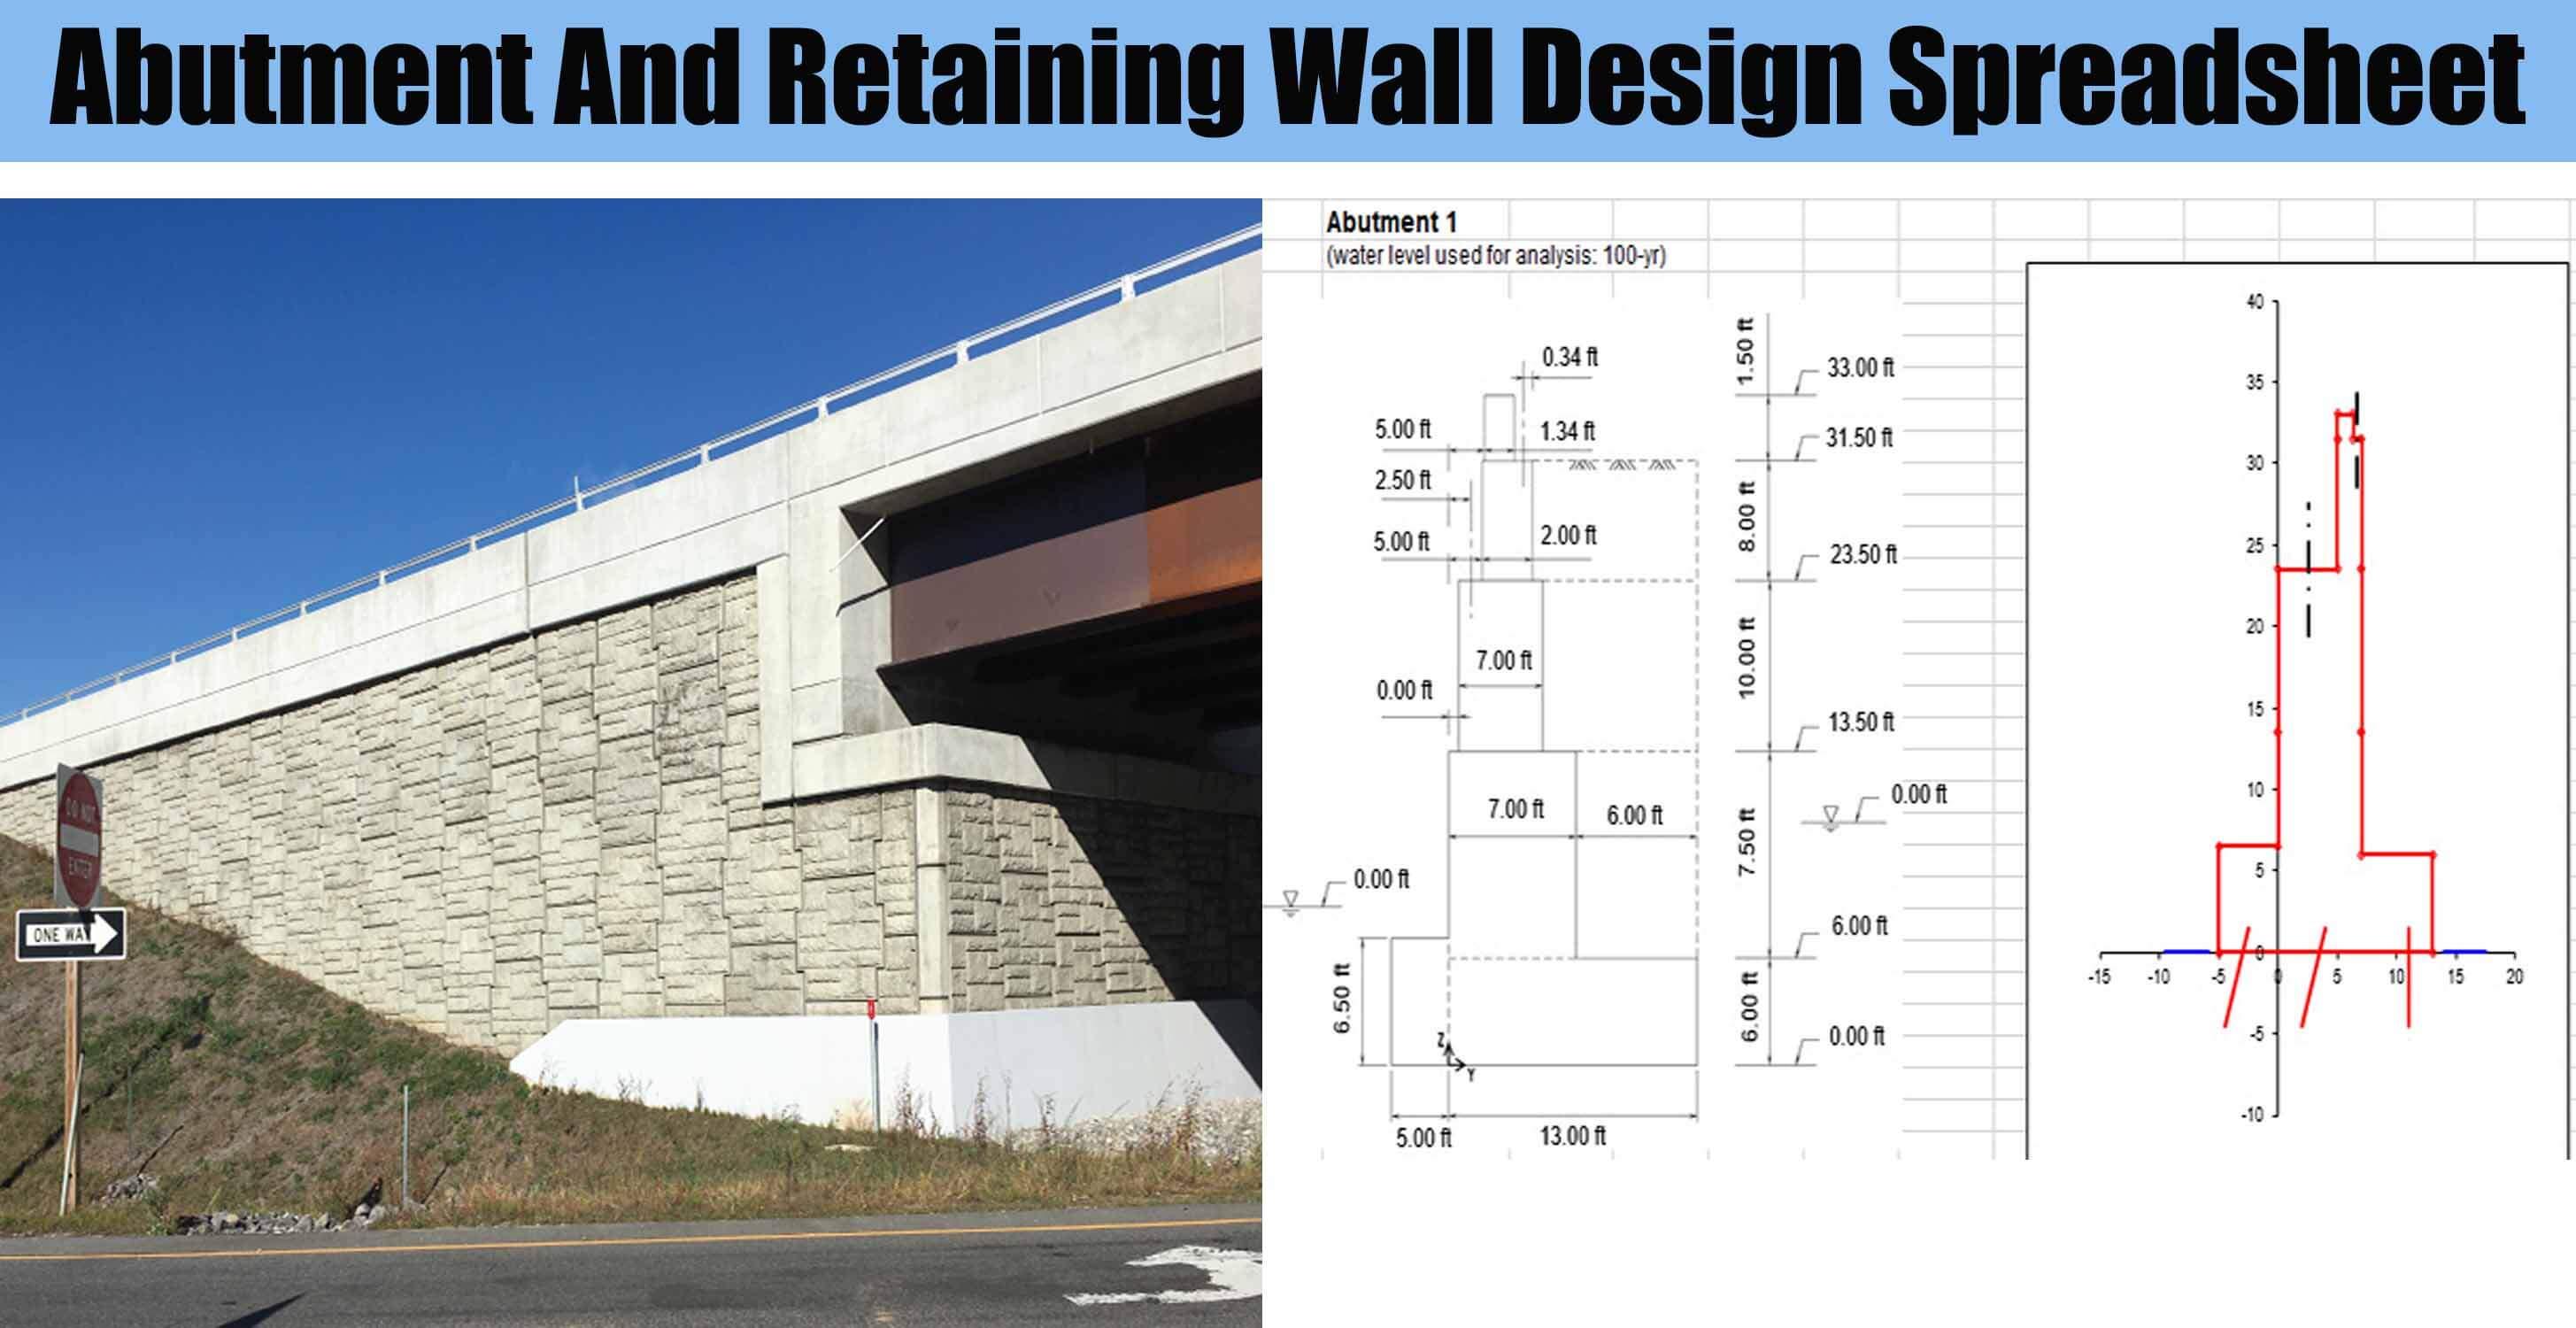 Abutment And Retaining Wall Design Spreadsheet - Engineering